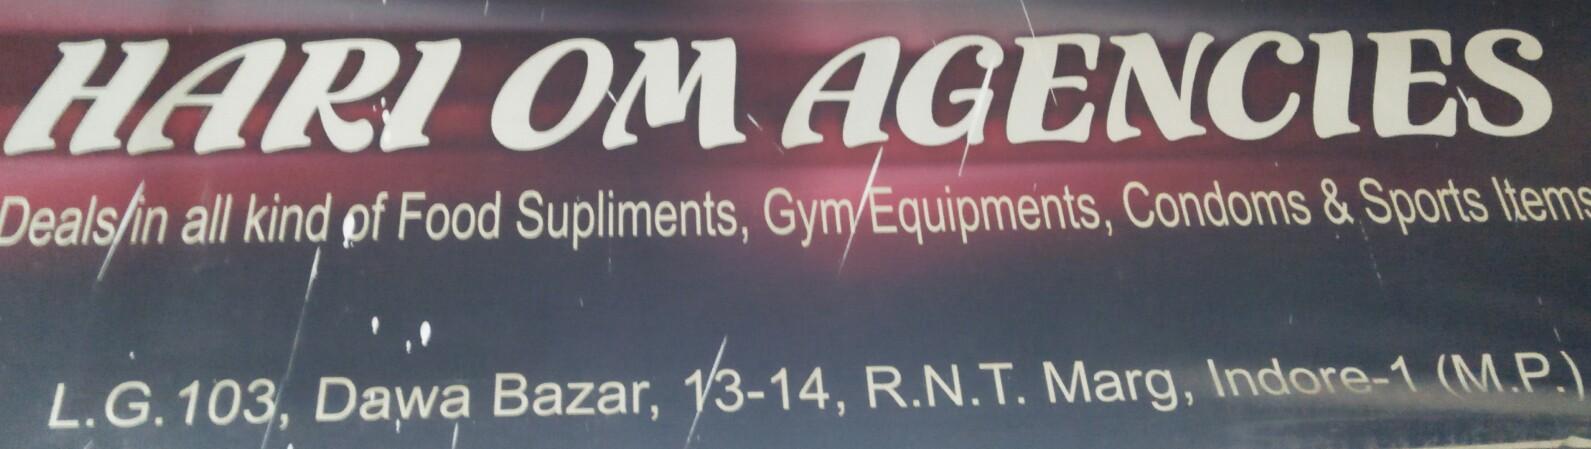 Hari om agencies